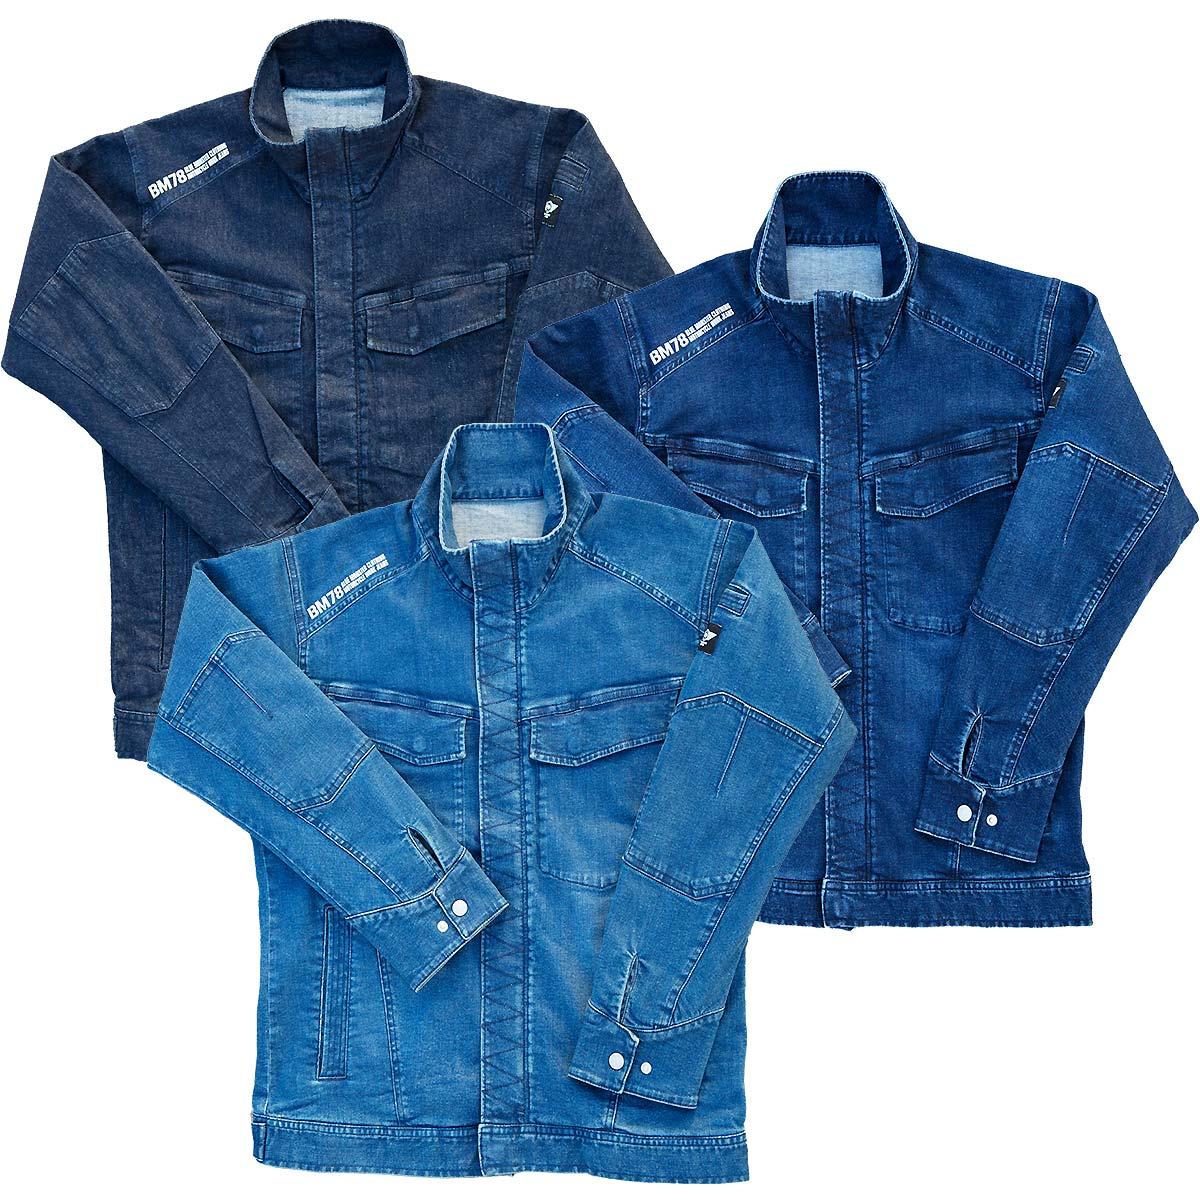 BMC-TOKYO: The Size That The Stretch Denim Urban Jacket